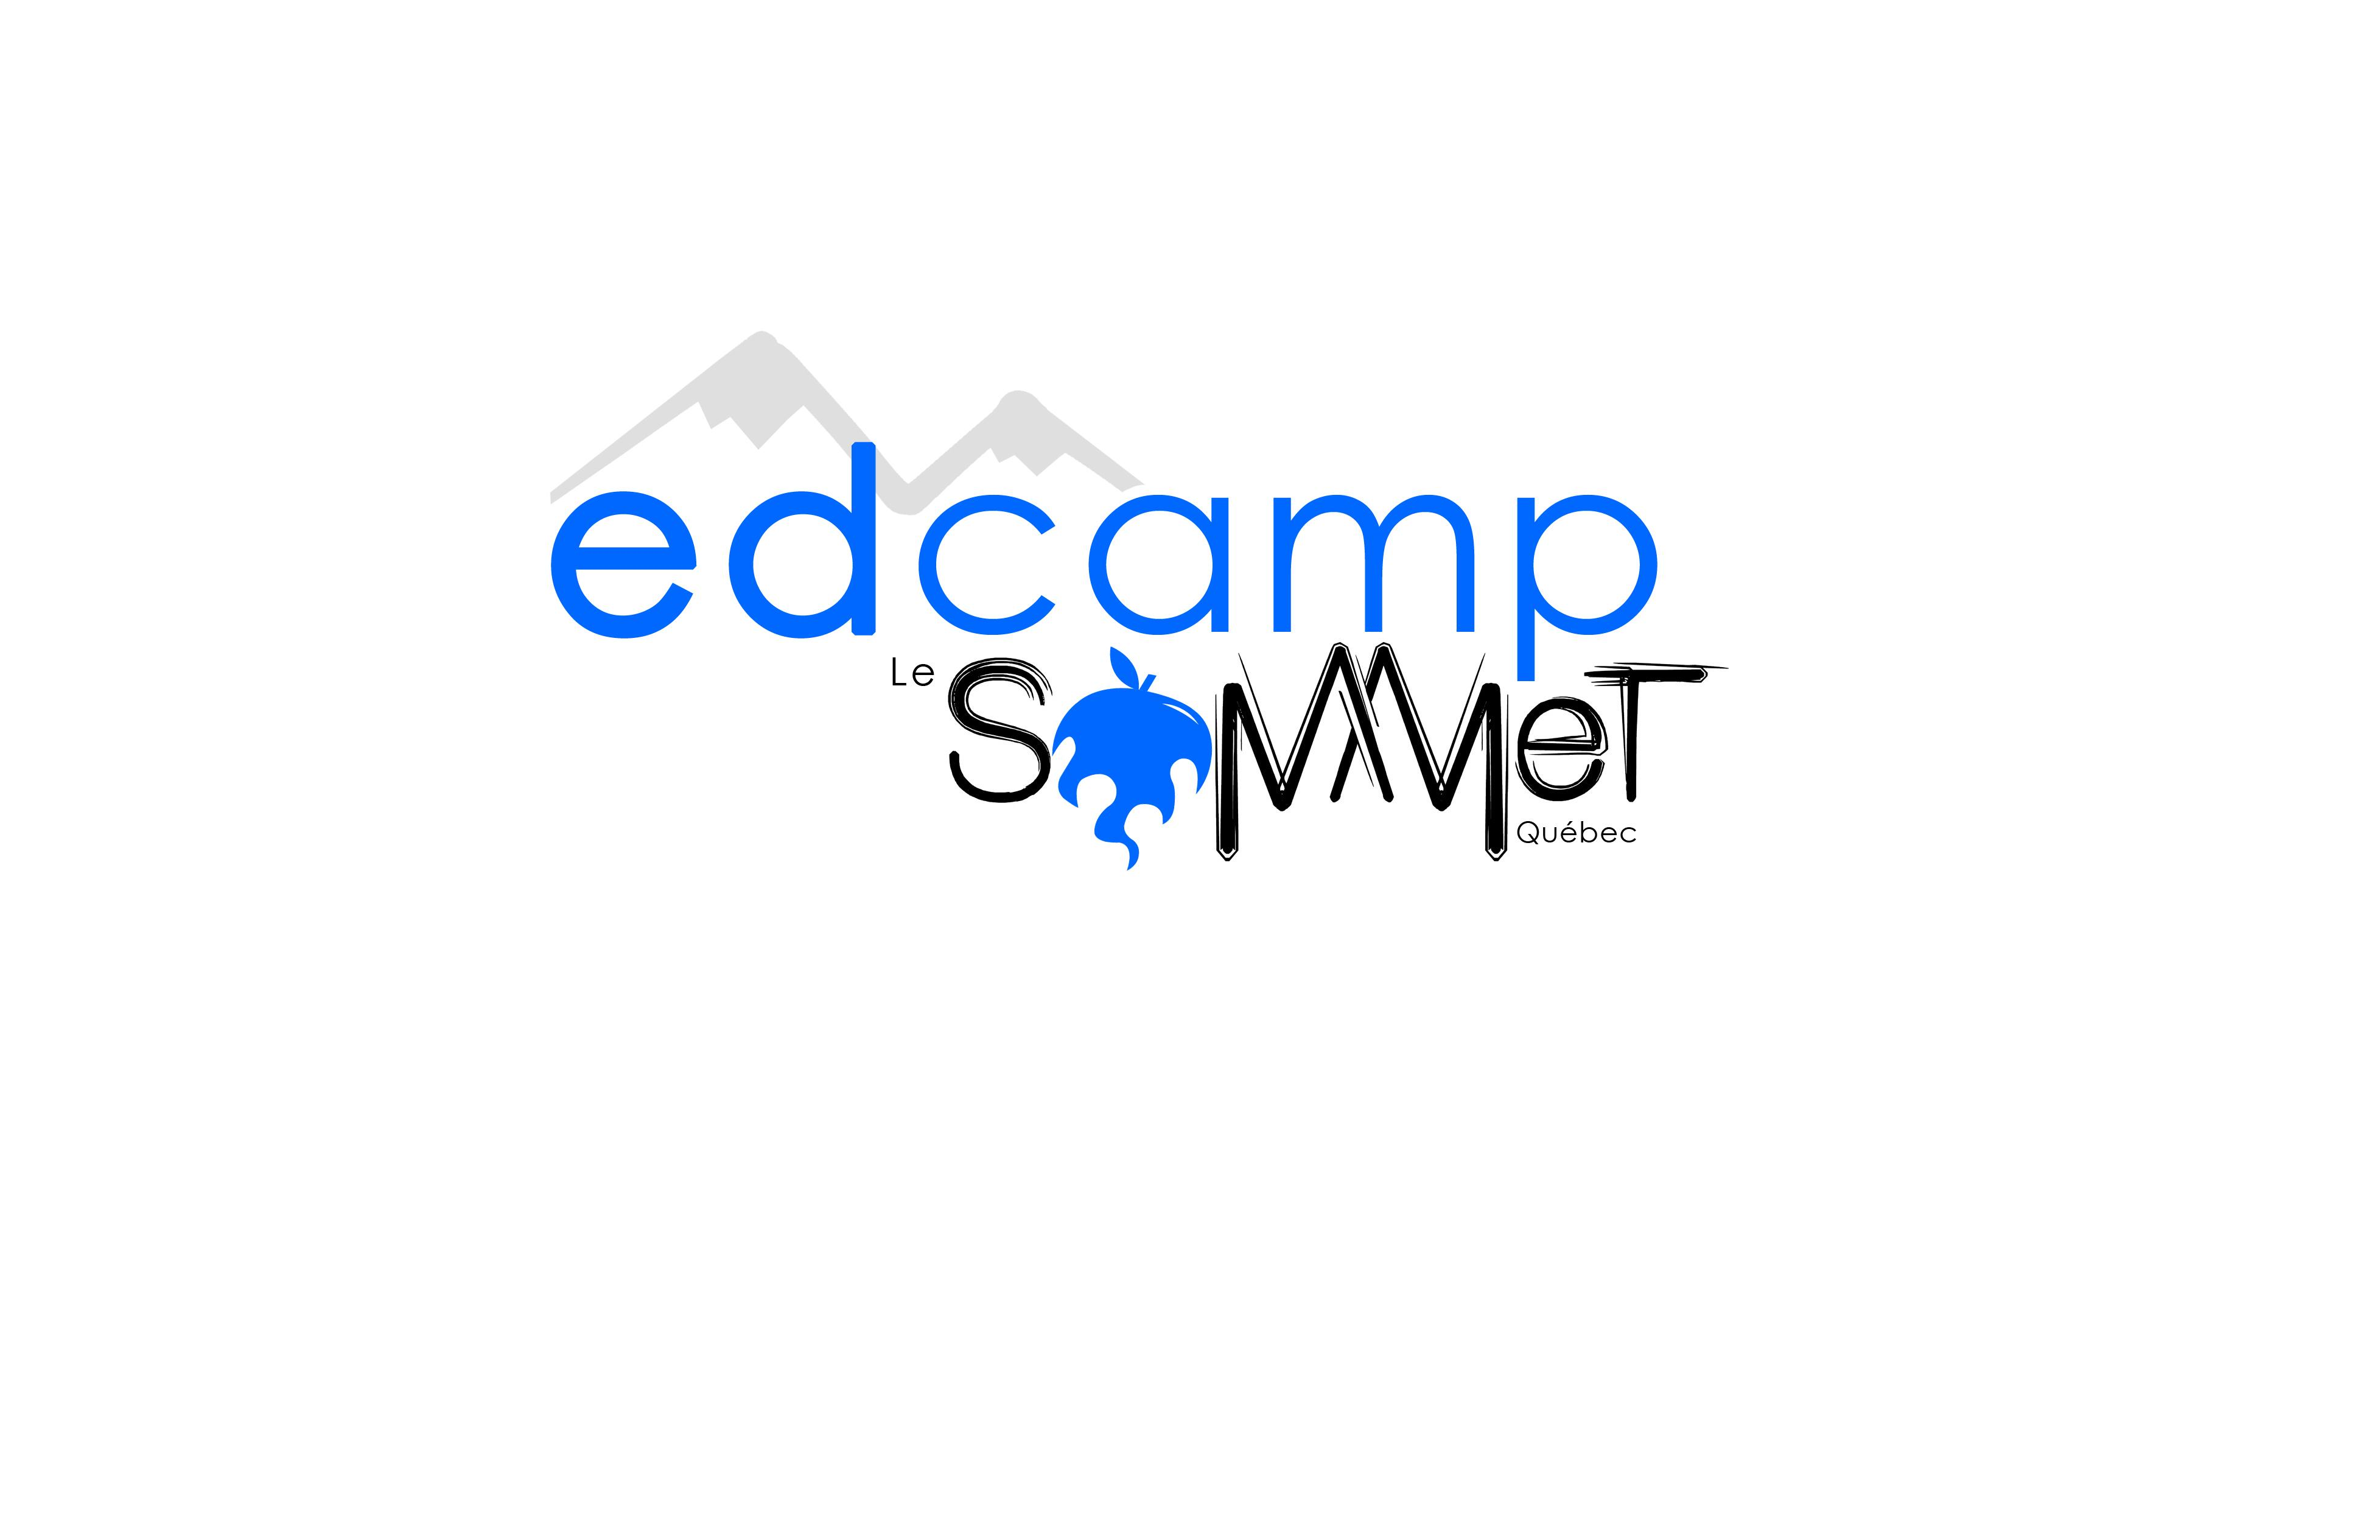 EdCamp Le Sommet 2017